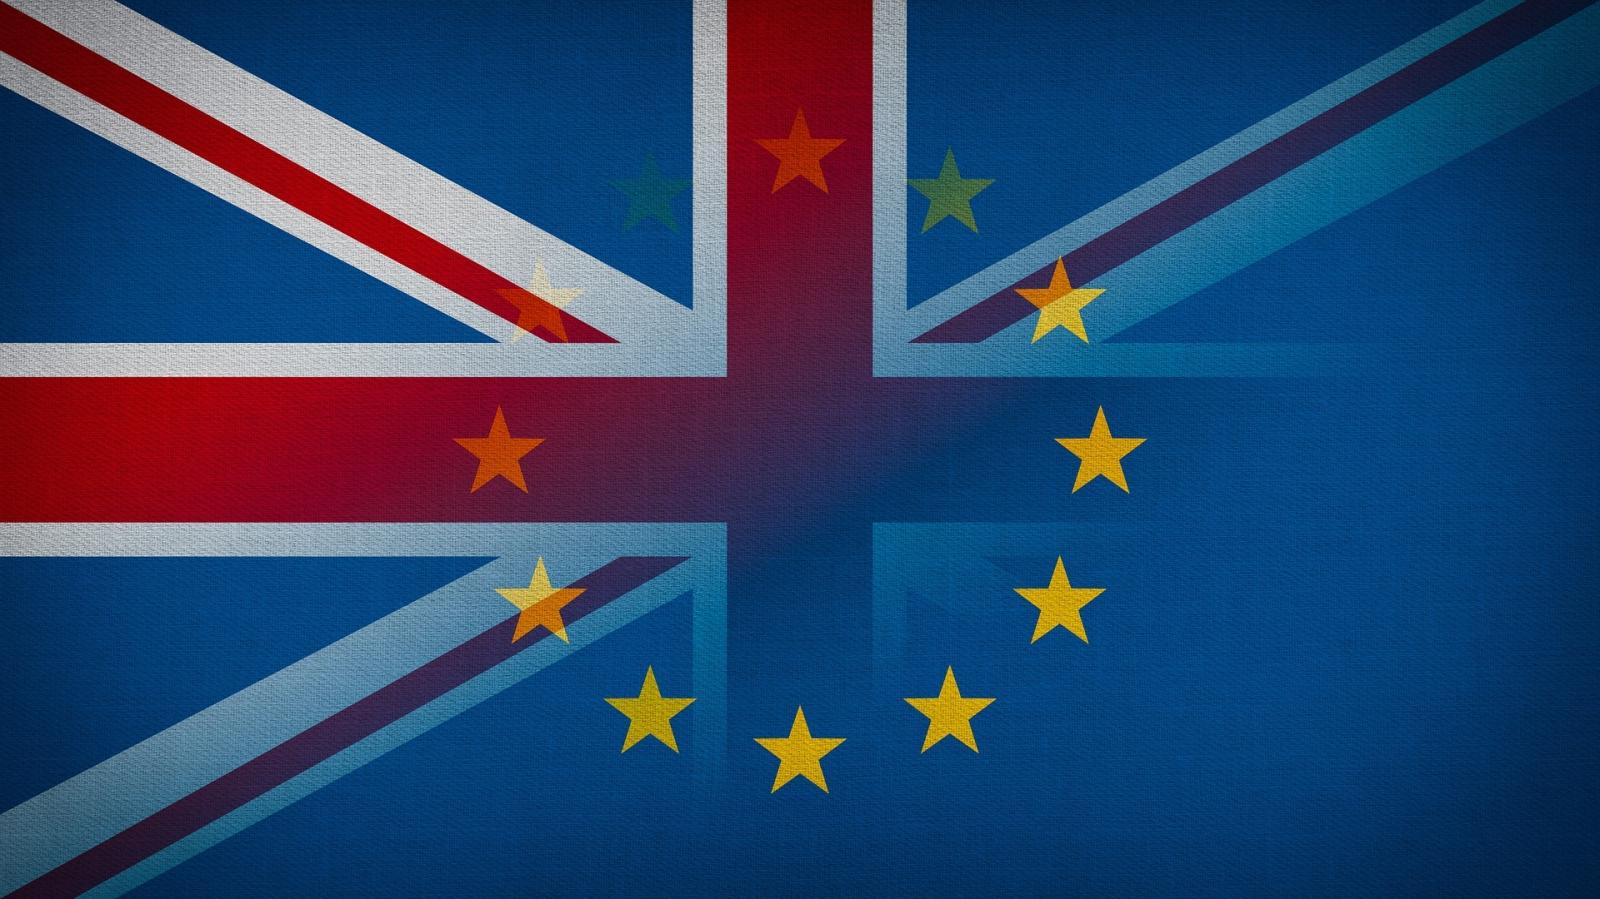 Новите преговори между Лондон и Брюксел отново в задънена улица